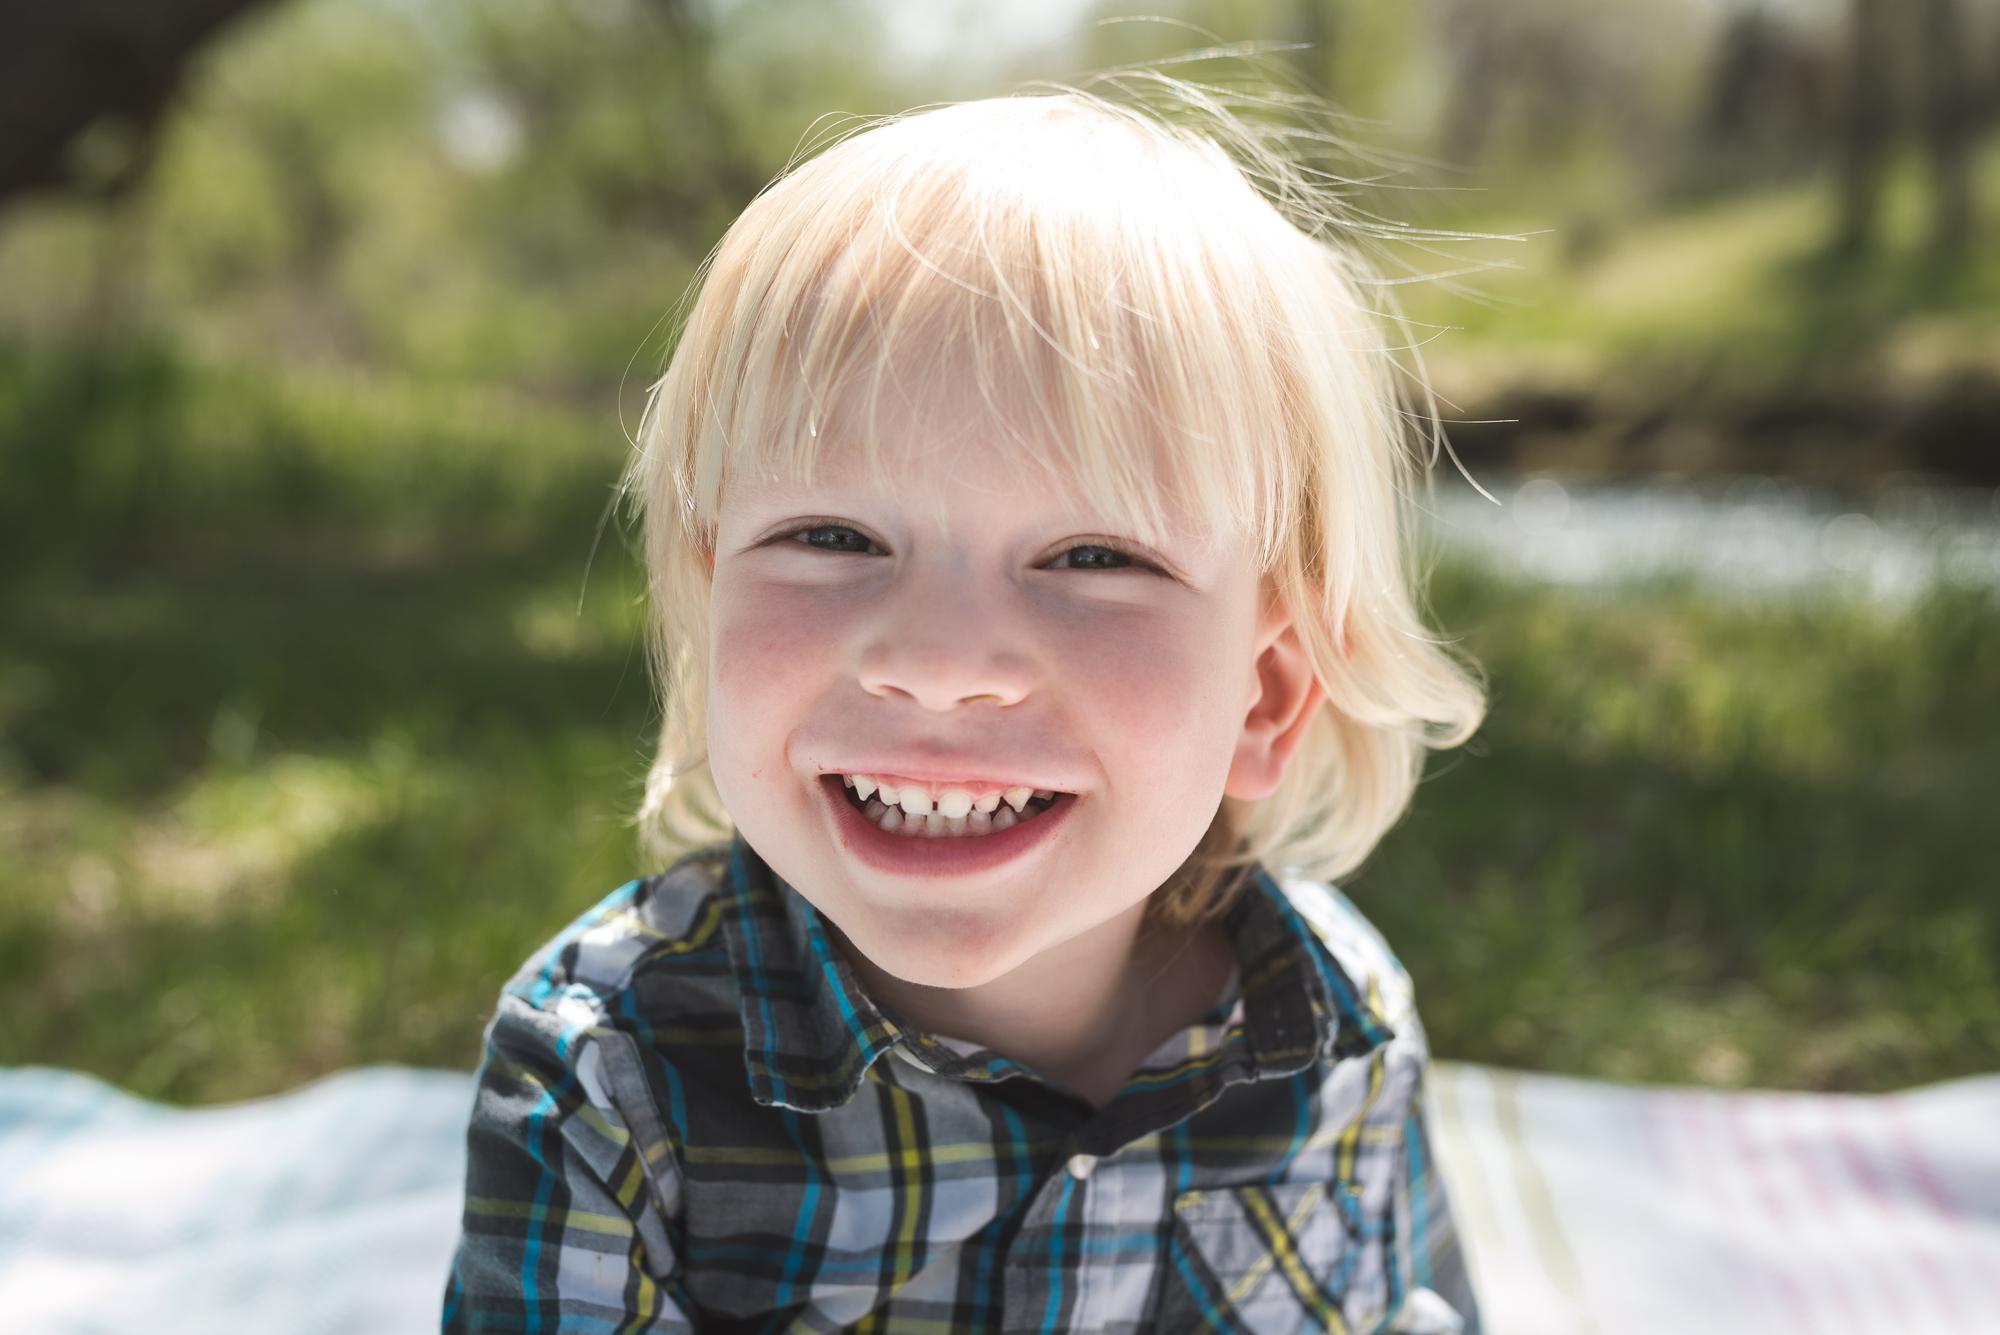 Denver+Boulder+Lifestyle+Family+Photographer+MiniSessions+JennyFolmanPhotography-16.jpg